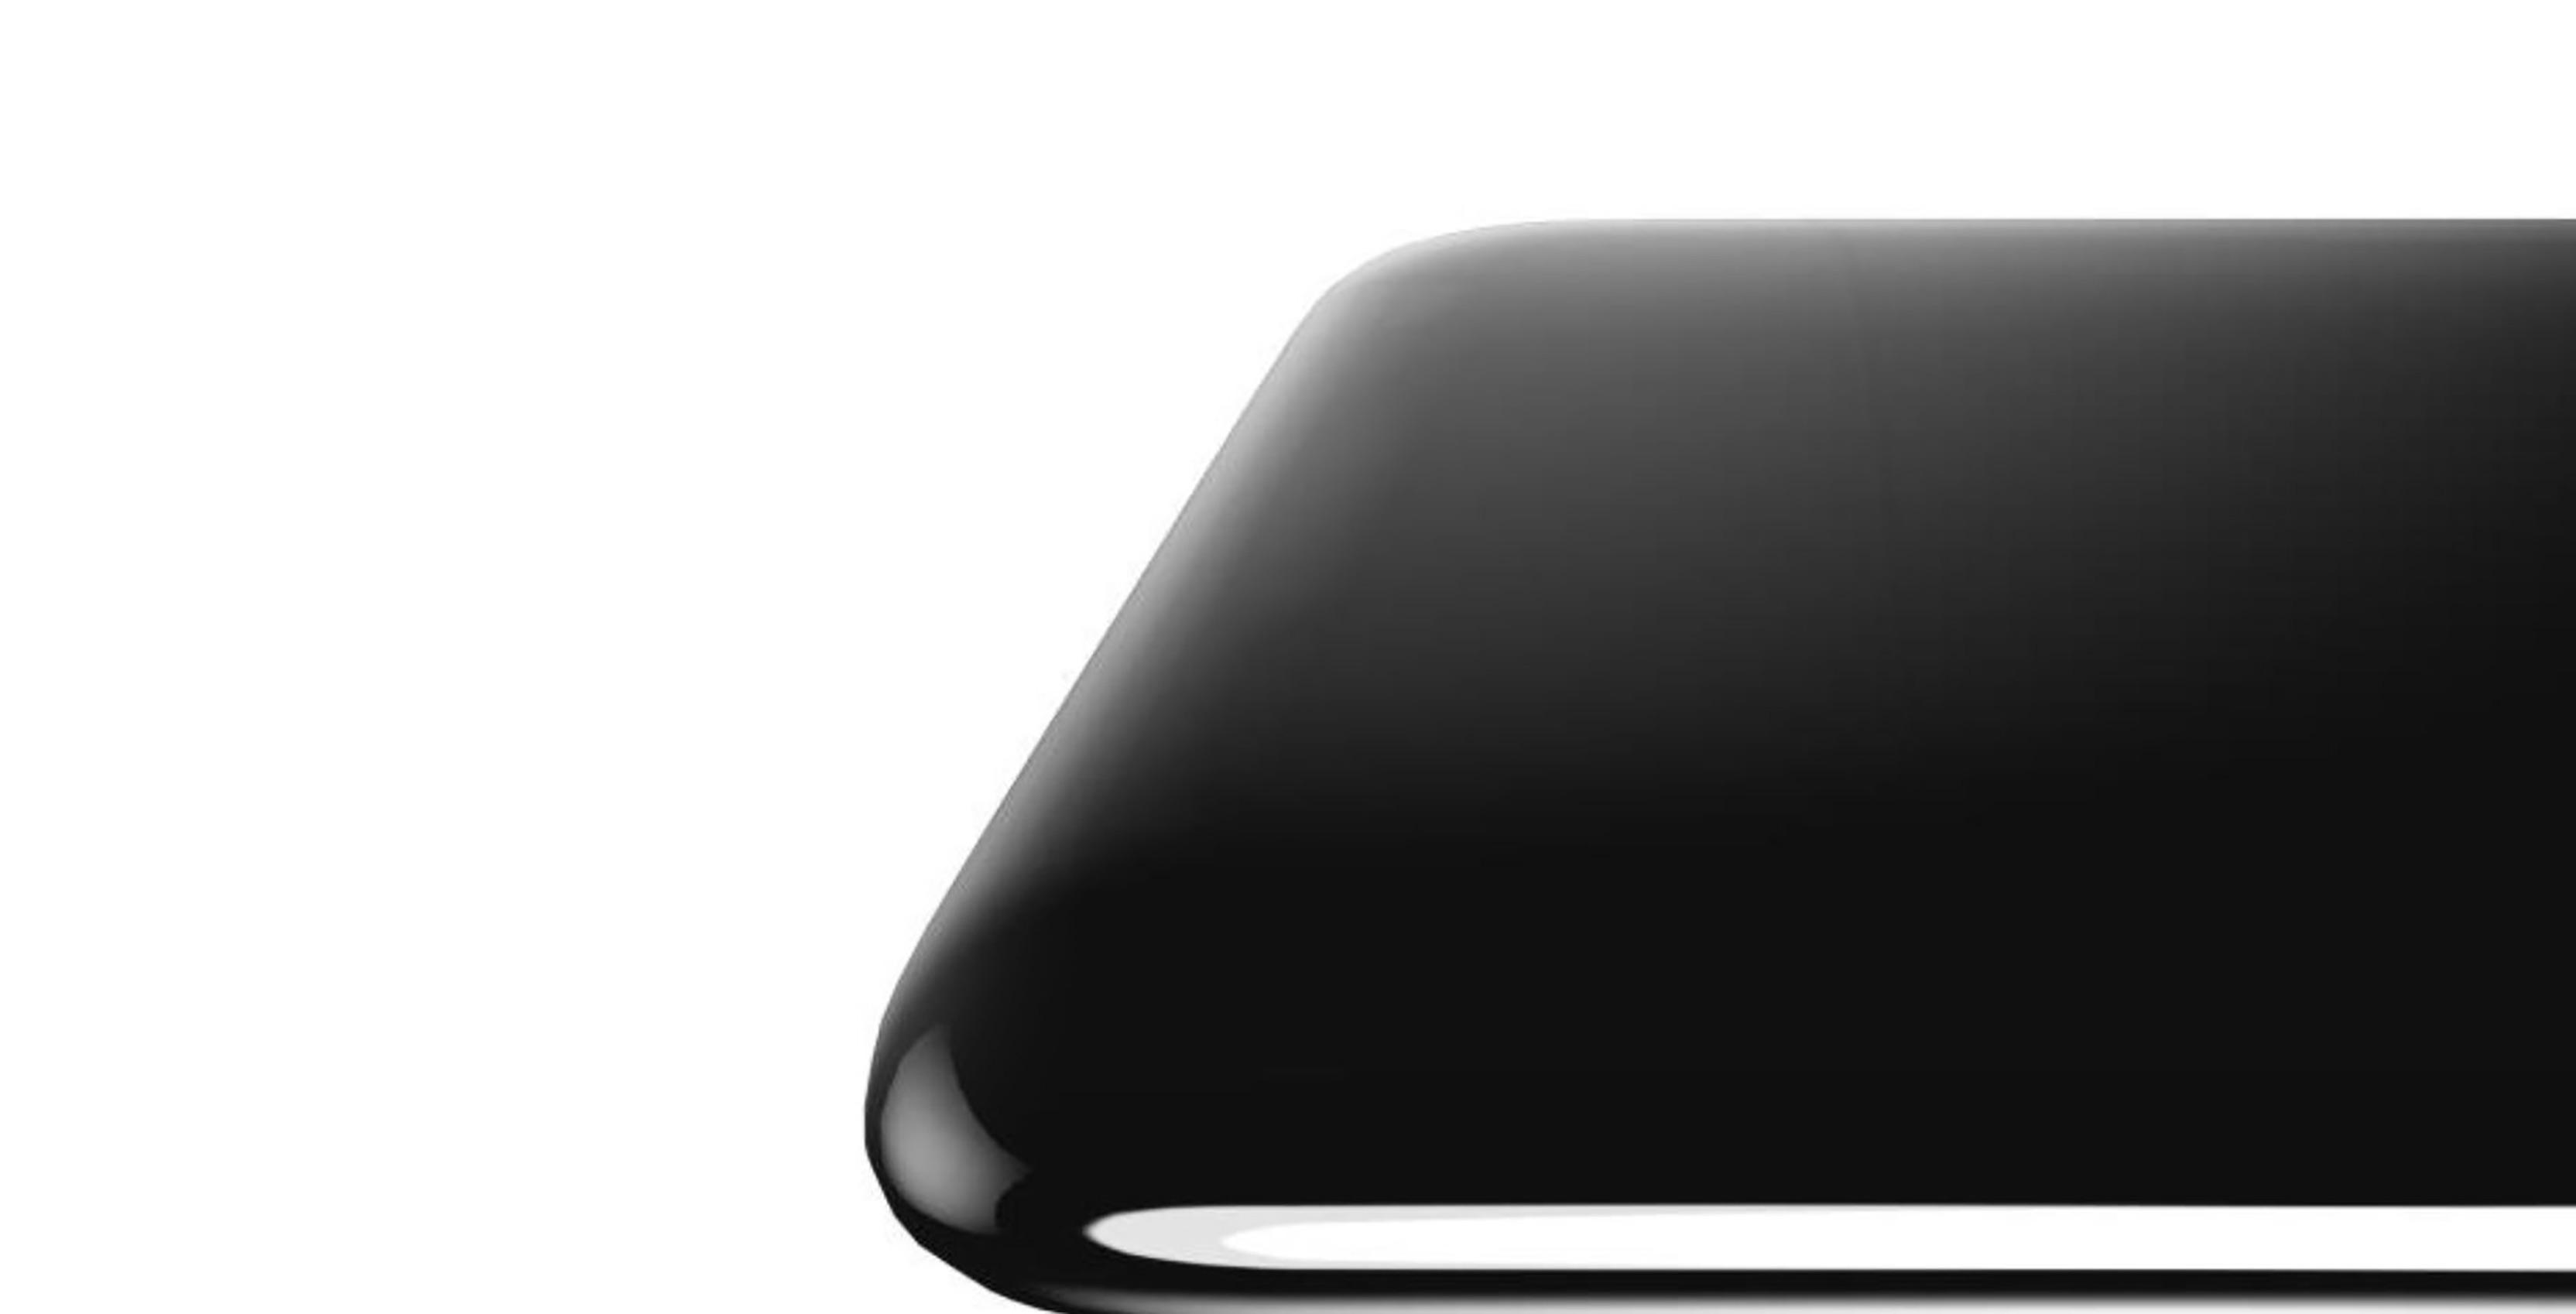 Vivo Apex 2019 concept render showcases the phone's bezel-less design